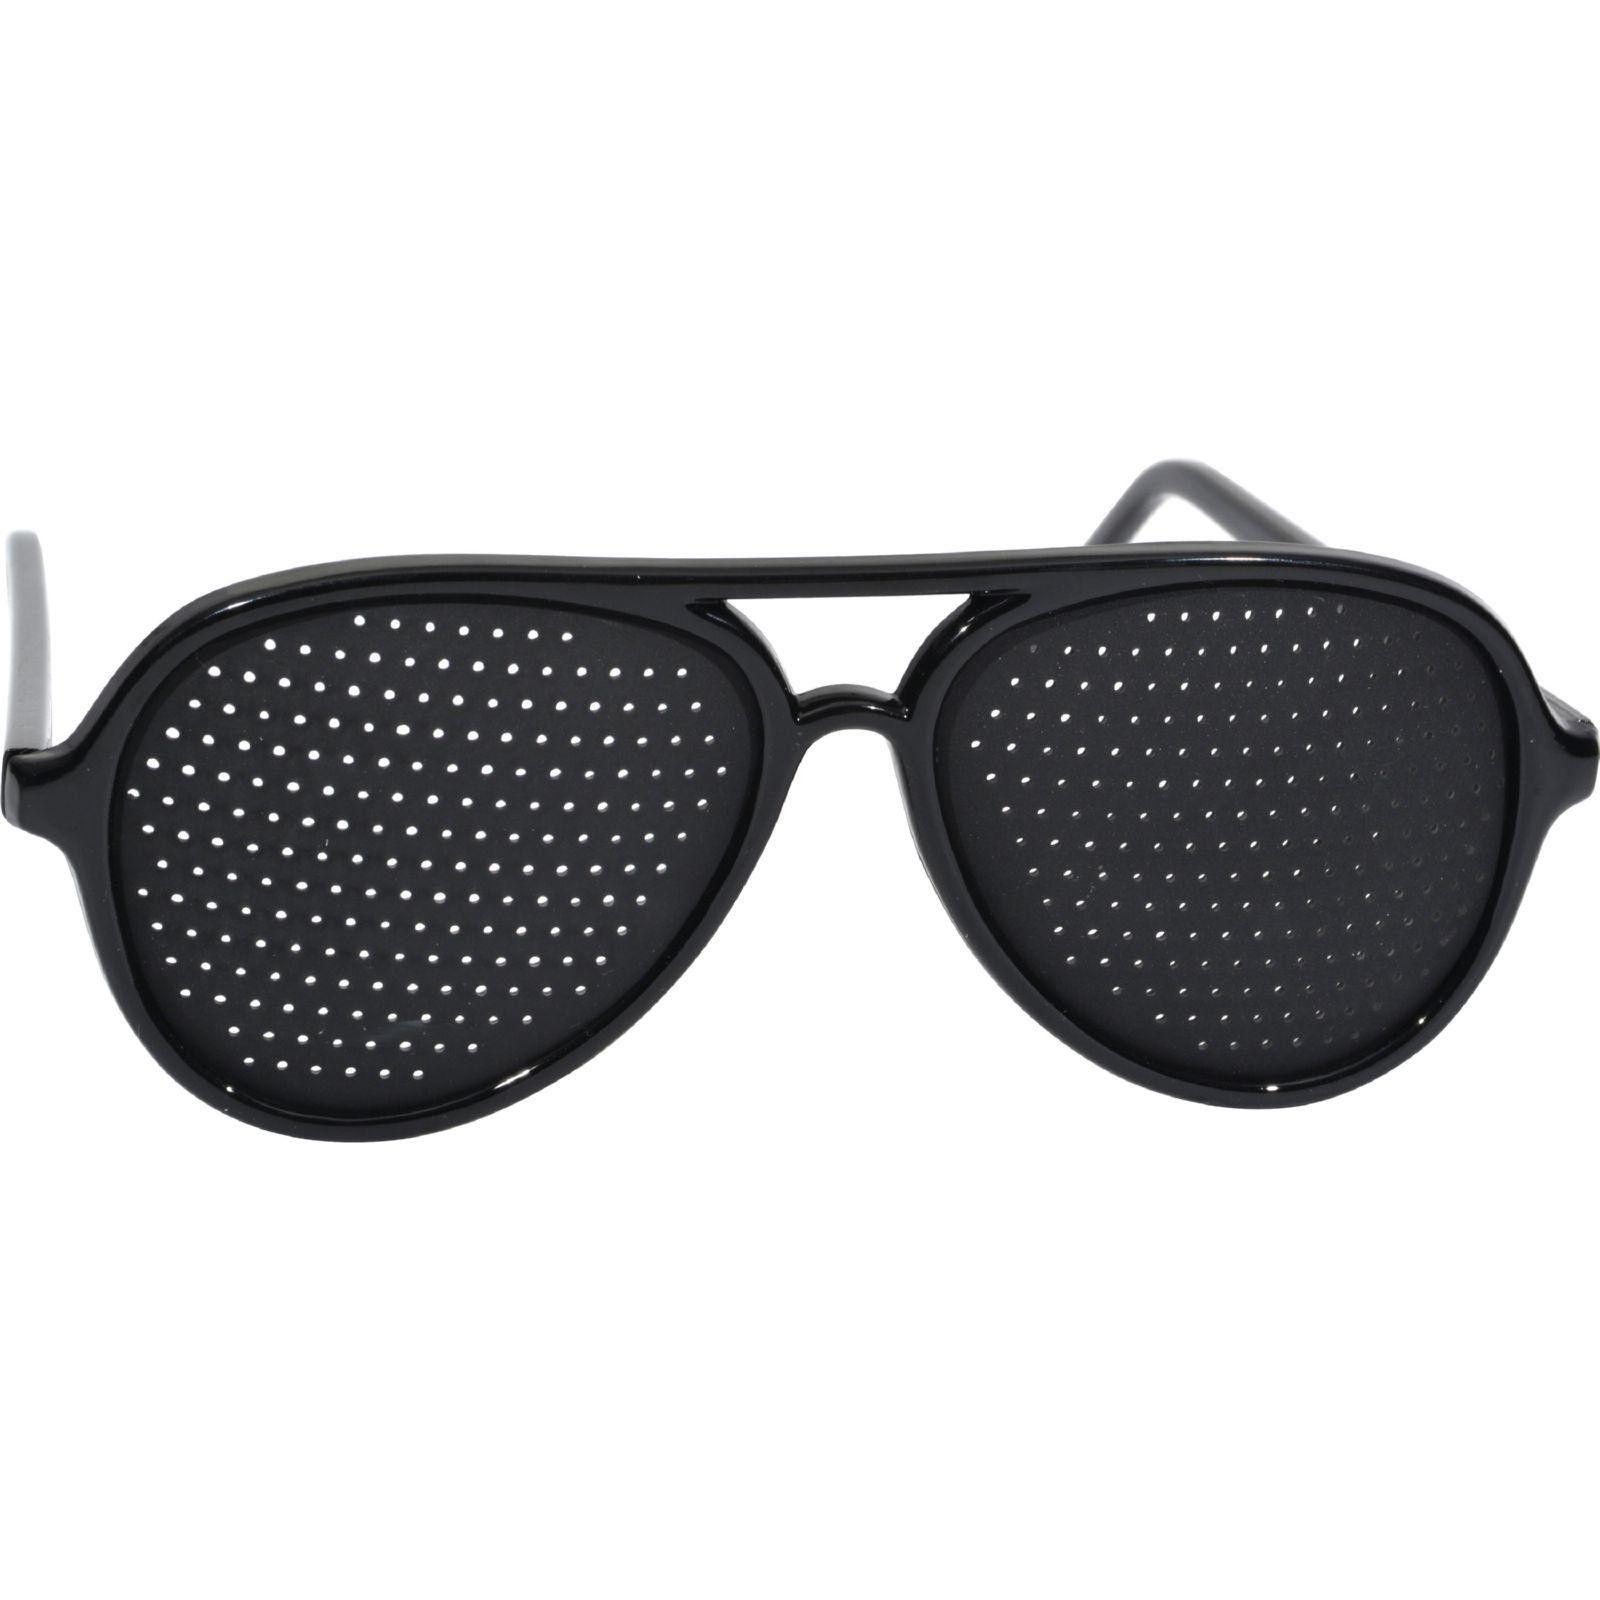 Heritage Products Pinhole Glasses Full Frame Black 1